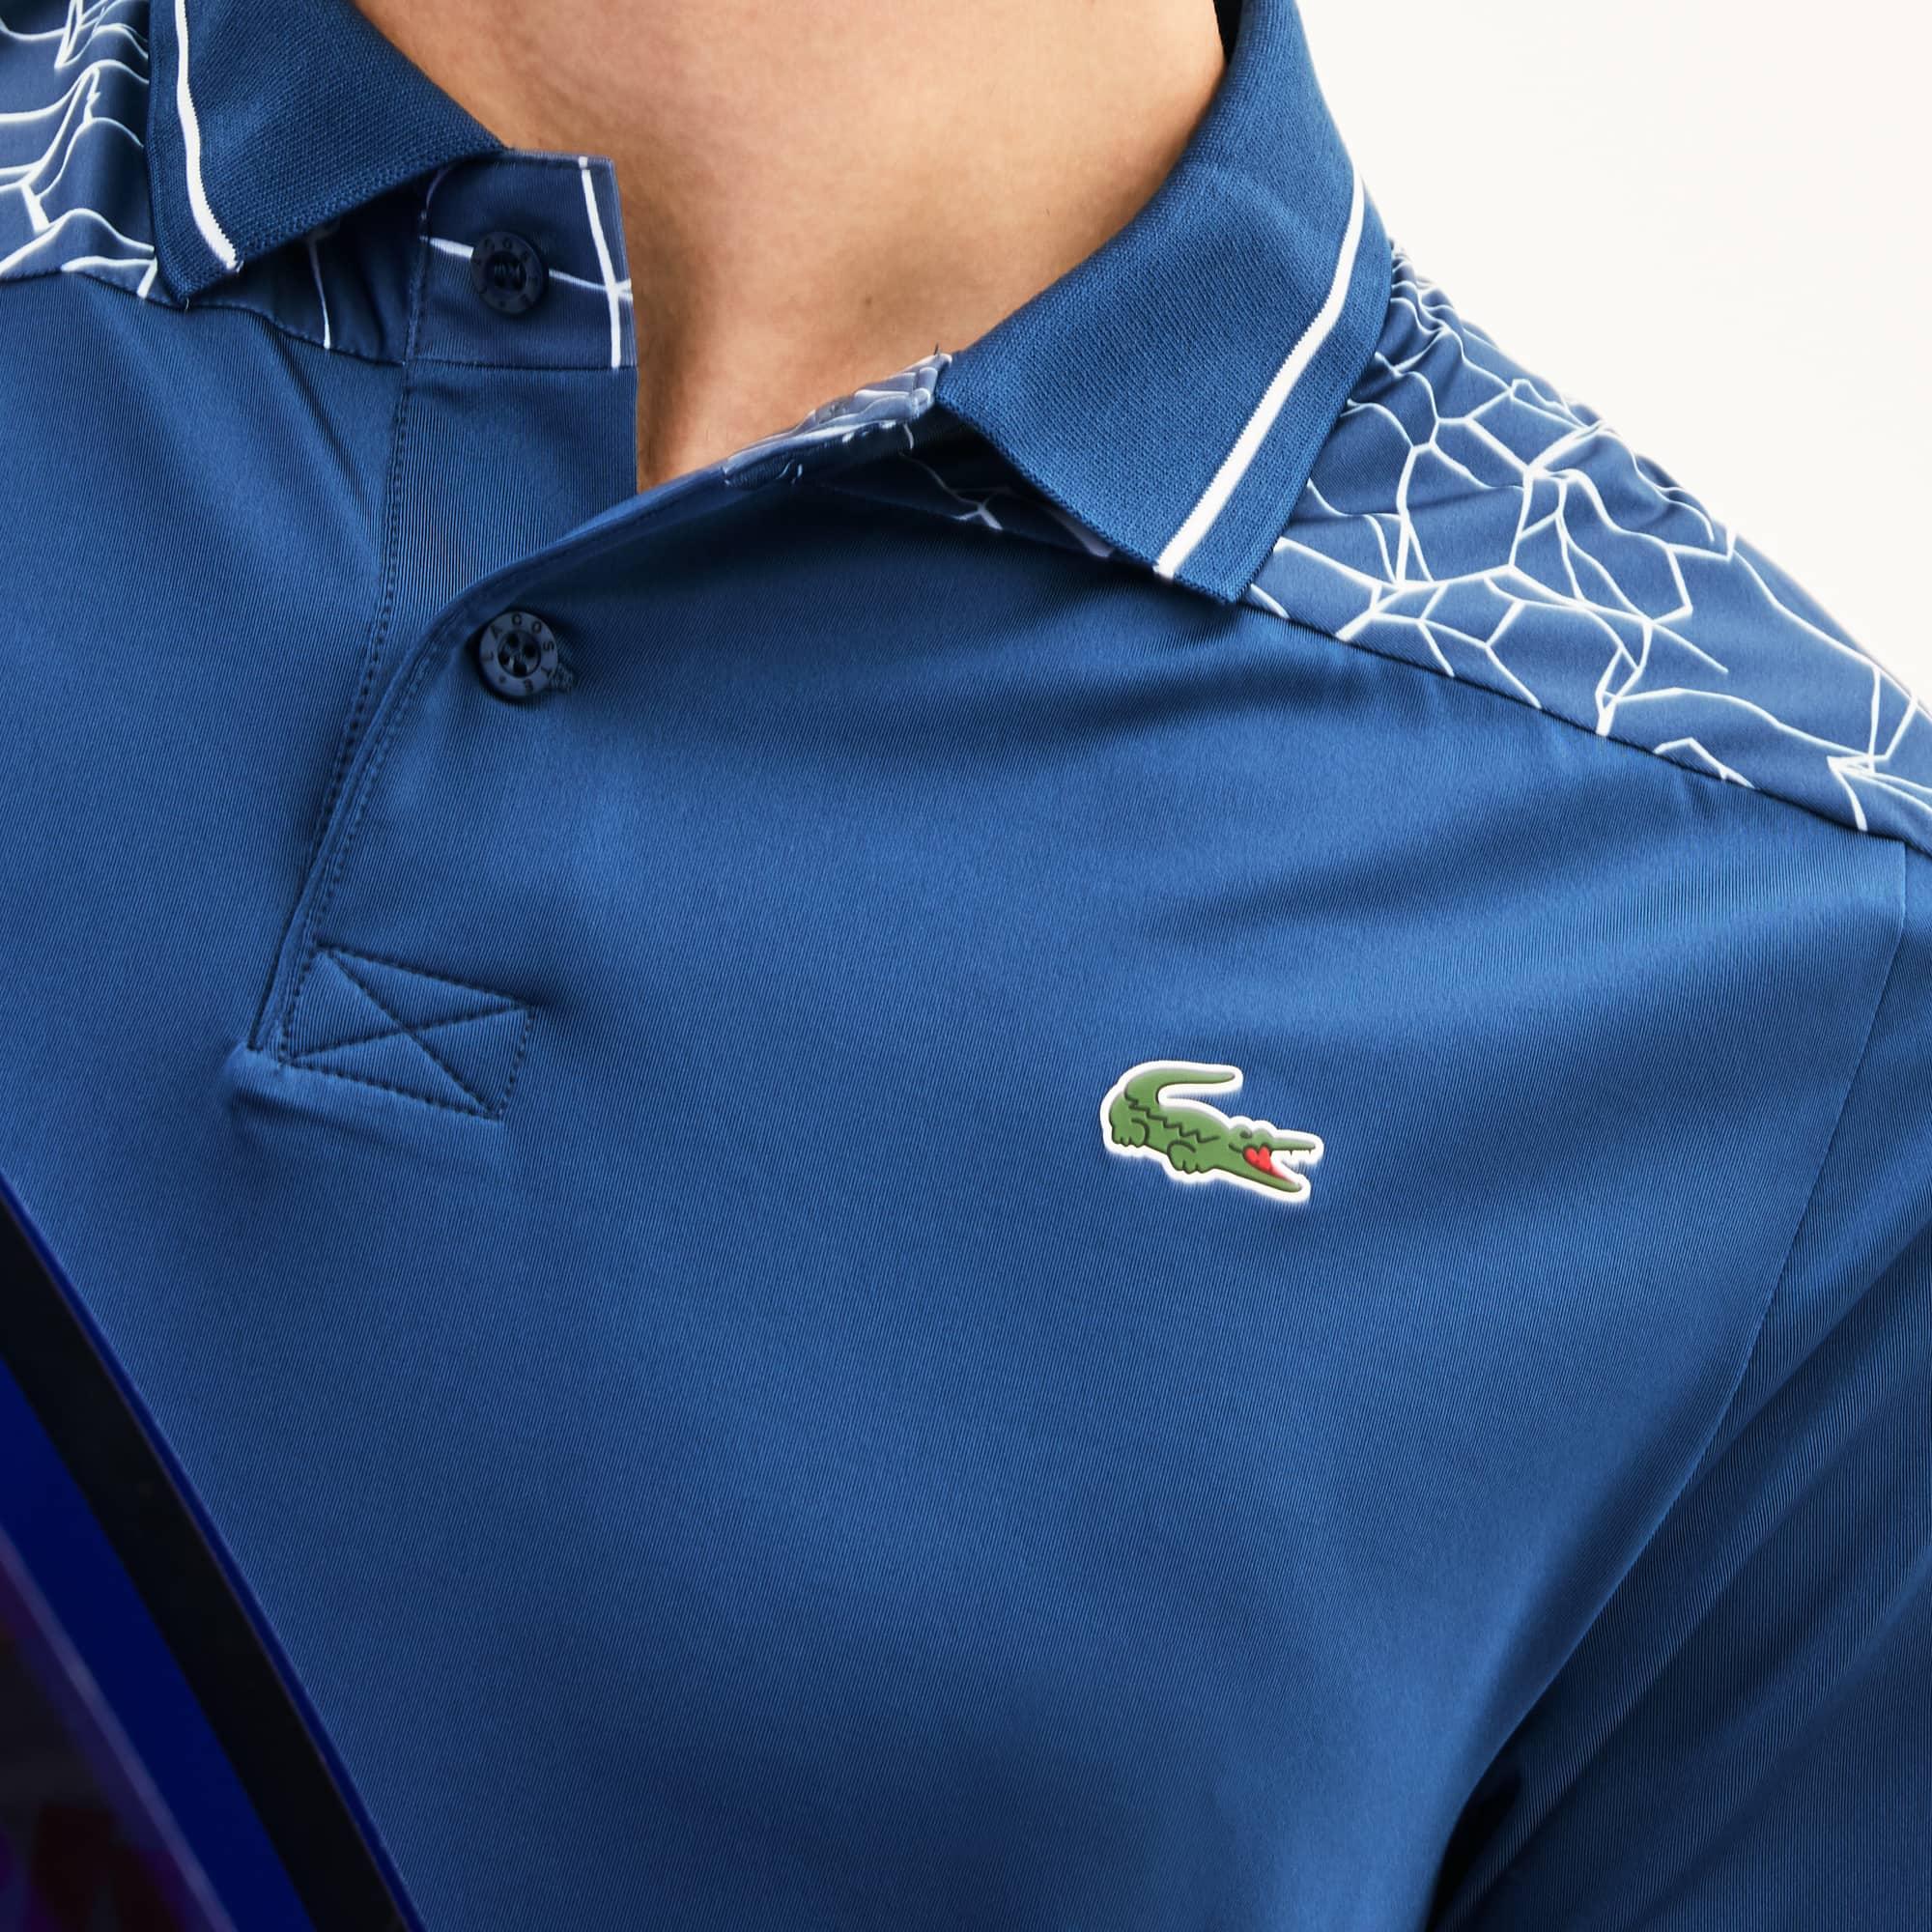 Lacoste - Herren-Poloshirt aus Stretch-Jersey LACOSTE SPORT NOVAK DJOKOVIC - 5